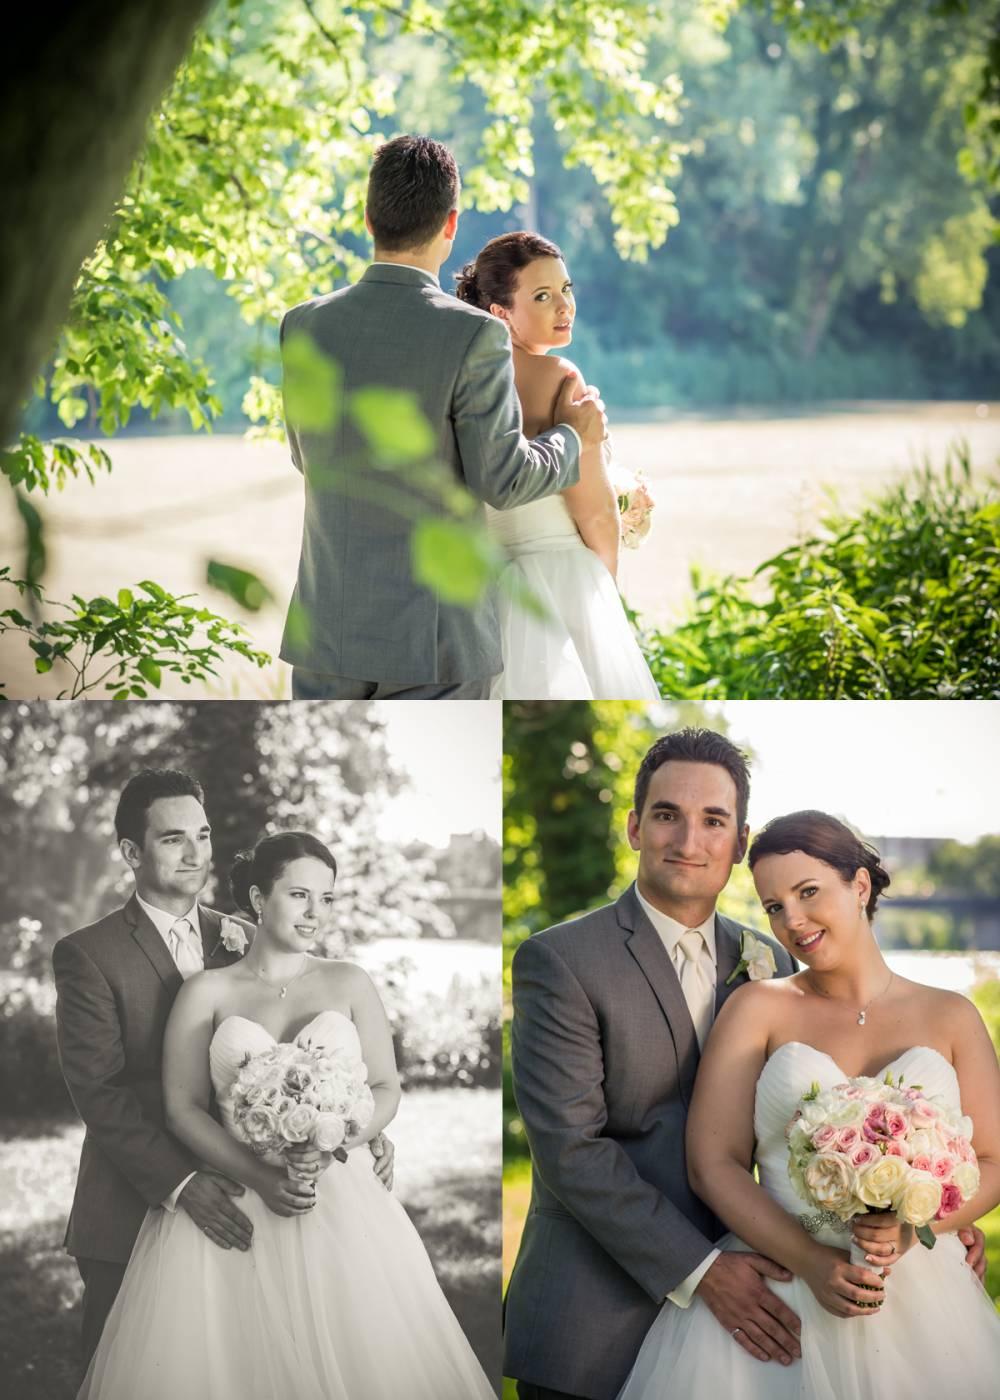 Best Chatham Wedding Photographer